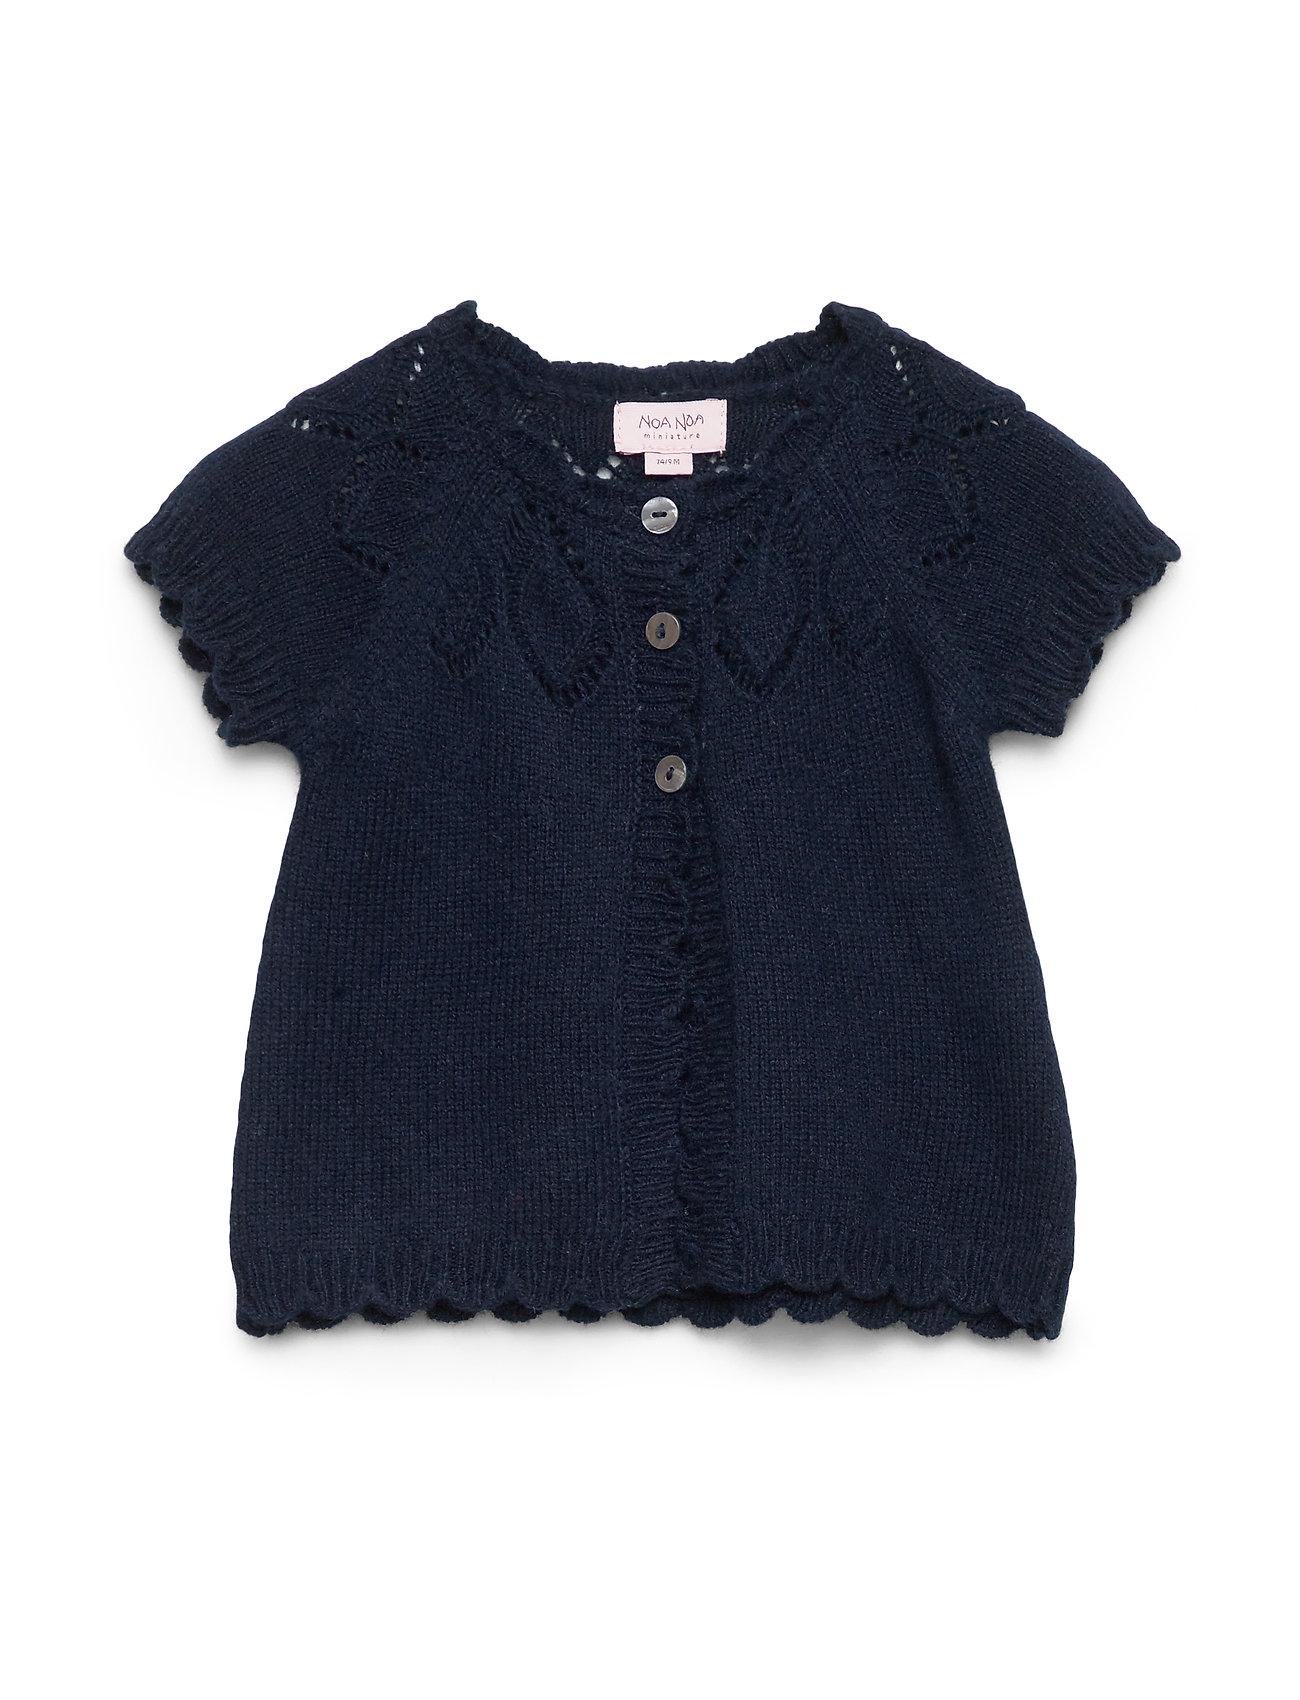 Noa Noa Miniature Vest - NAVY BLAZER